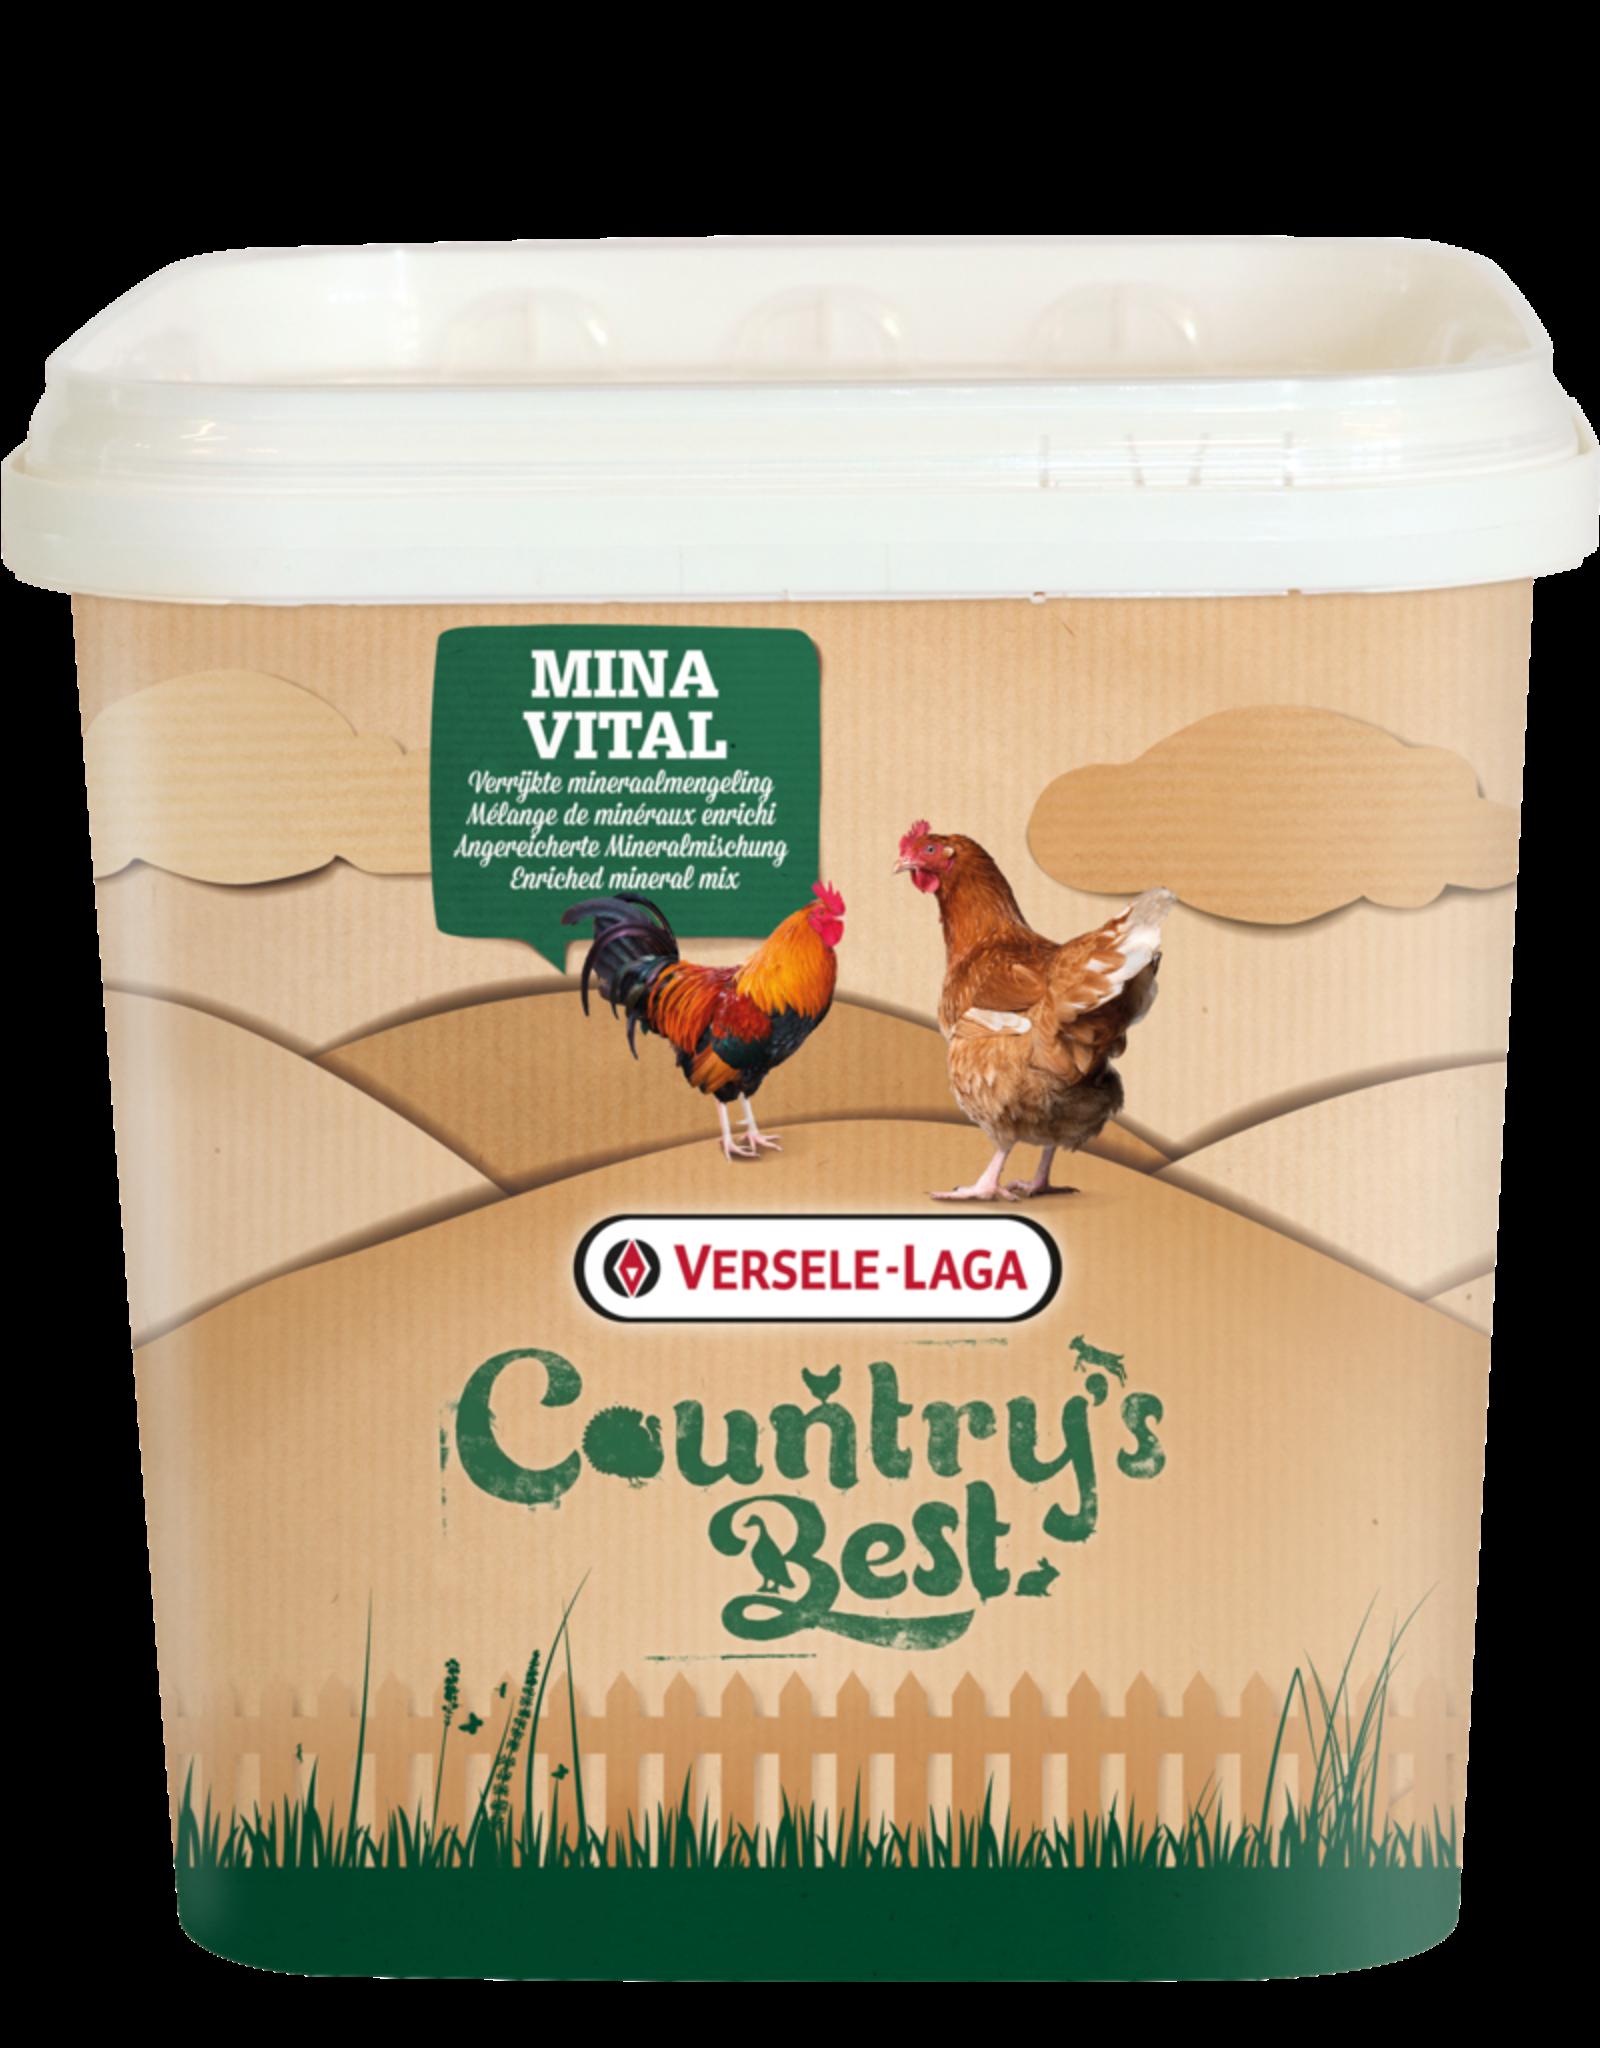 Versele laga Country best Mina Vital - 4 KG